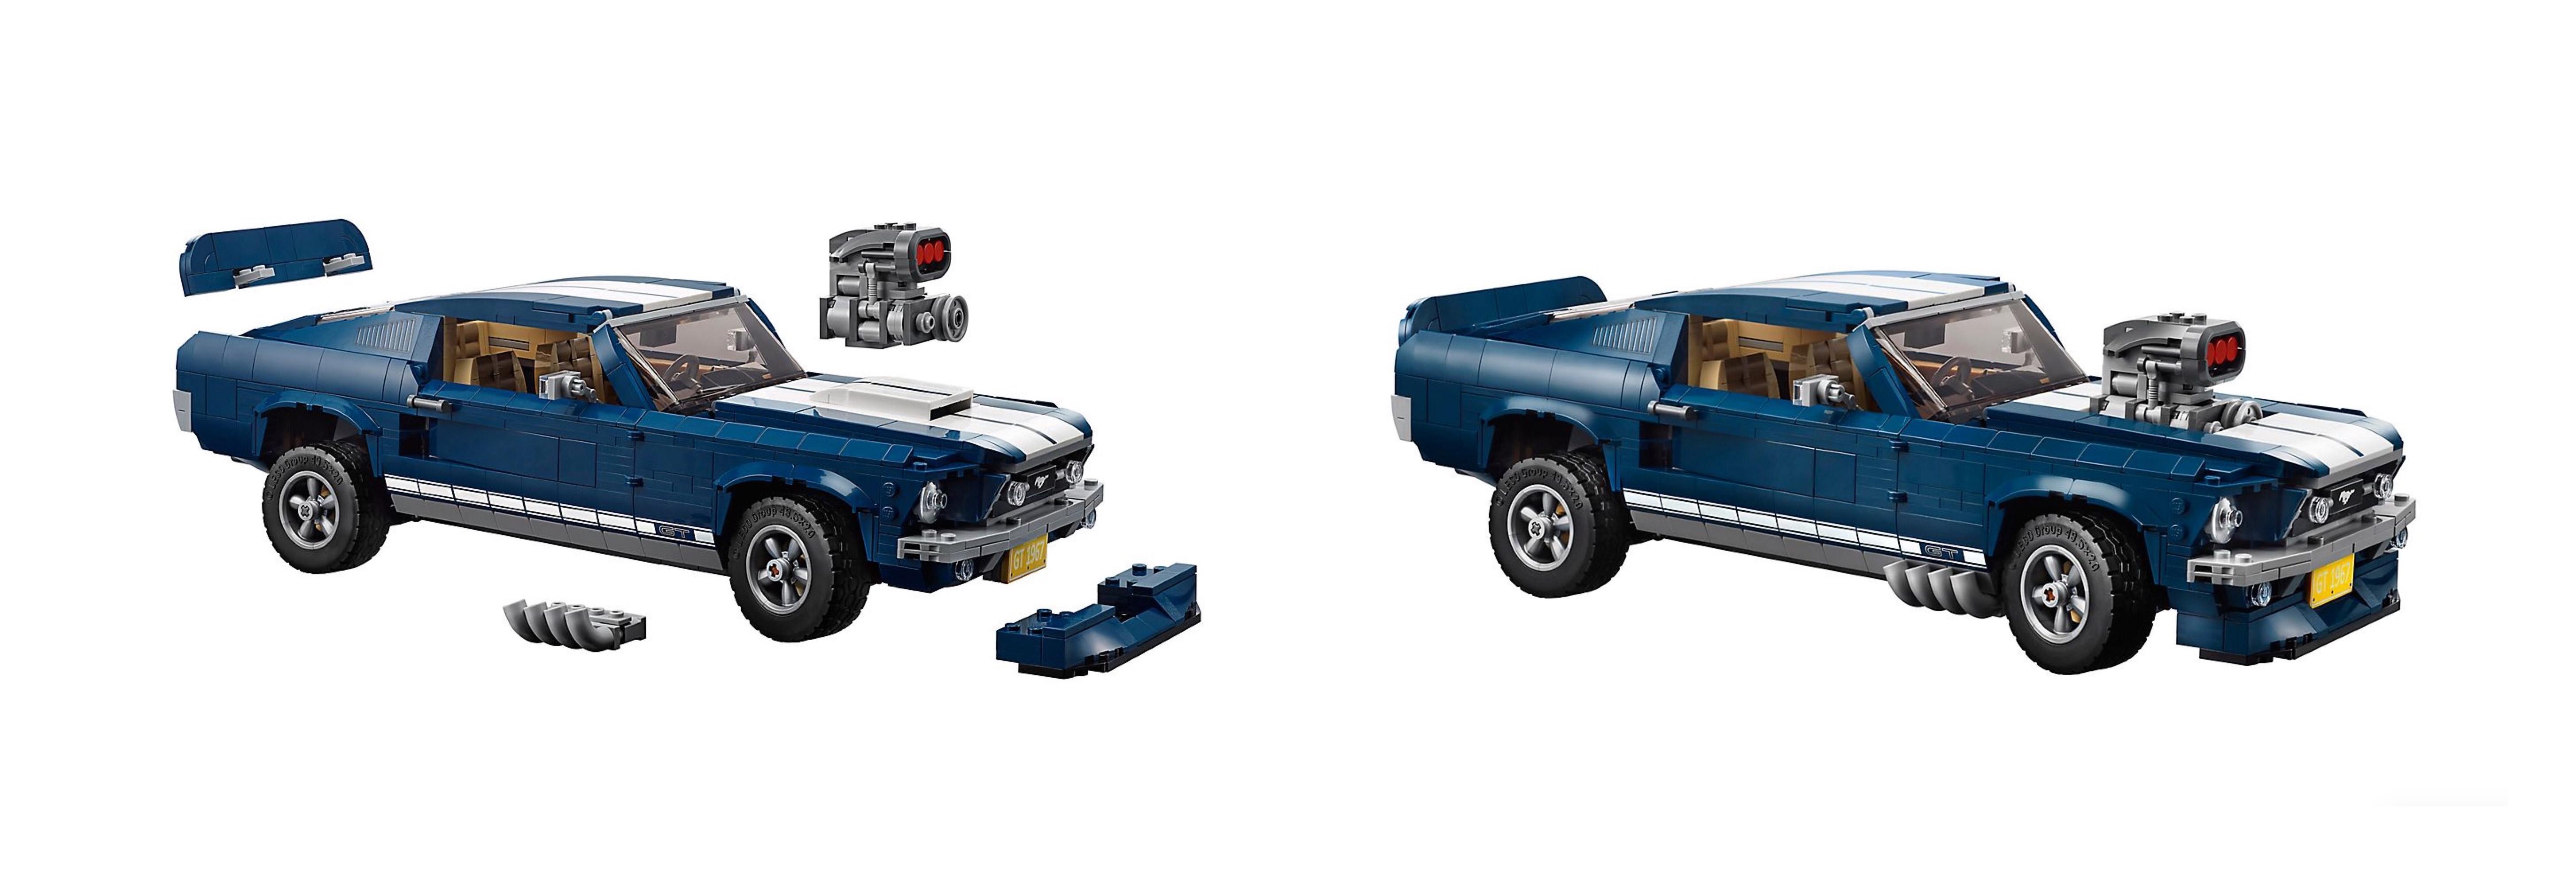 Lego Mustang